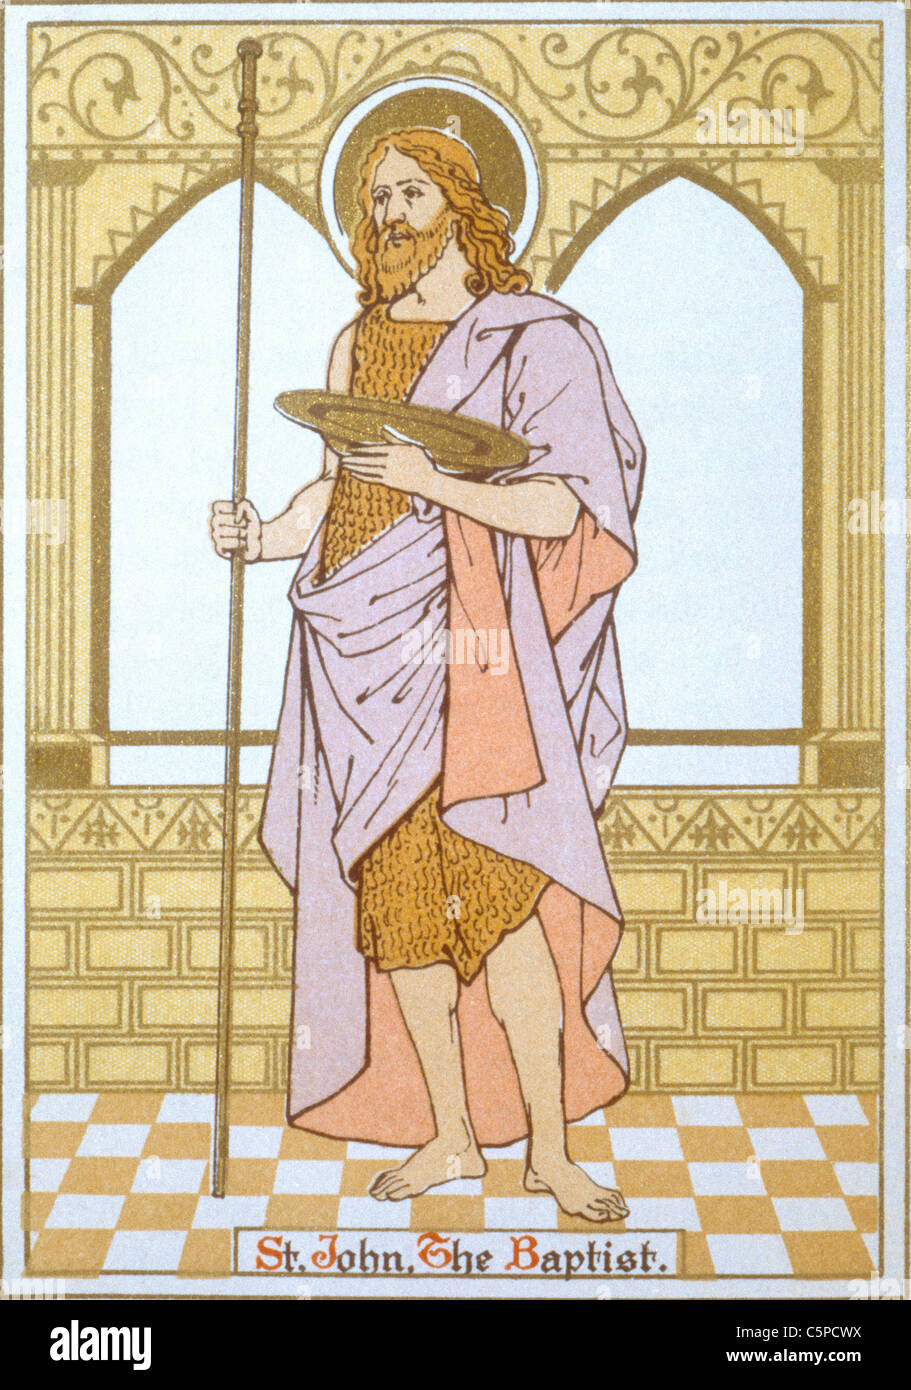 Saint John The Baptist - Stock Image